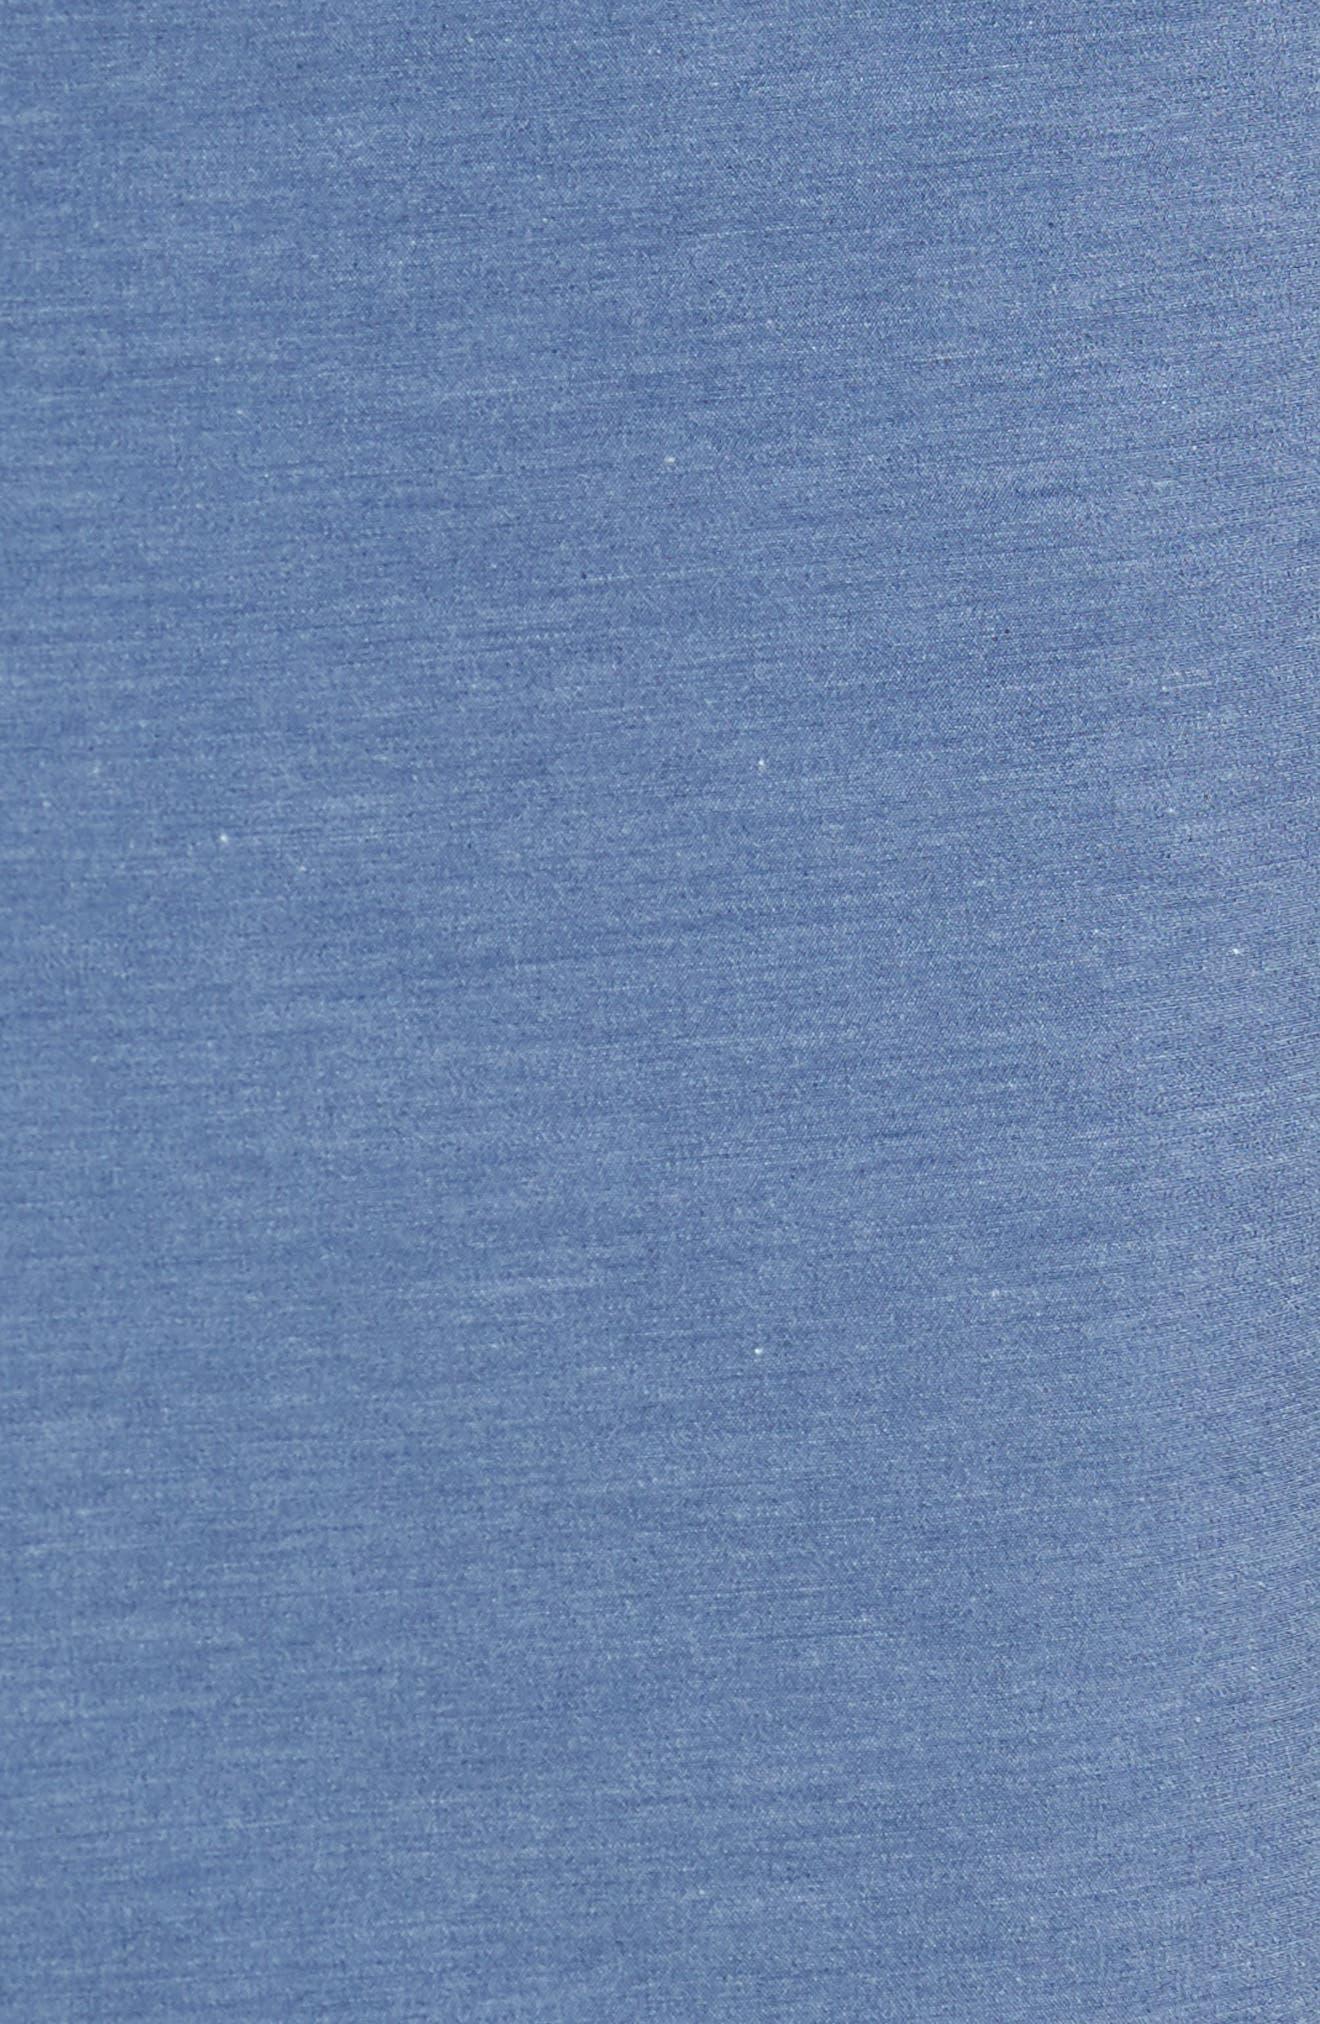 Retro Surf Stripe Board Shorts,                             Alternate thumbnail 4, color,                             Blue Red White